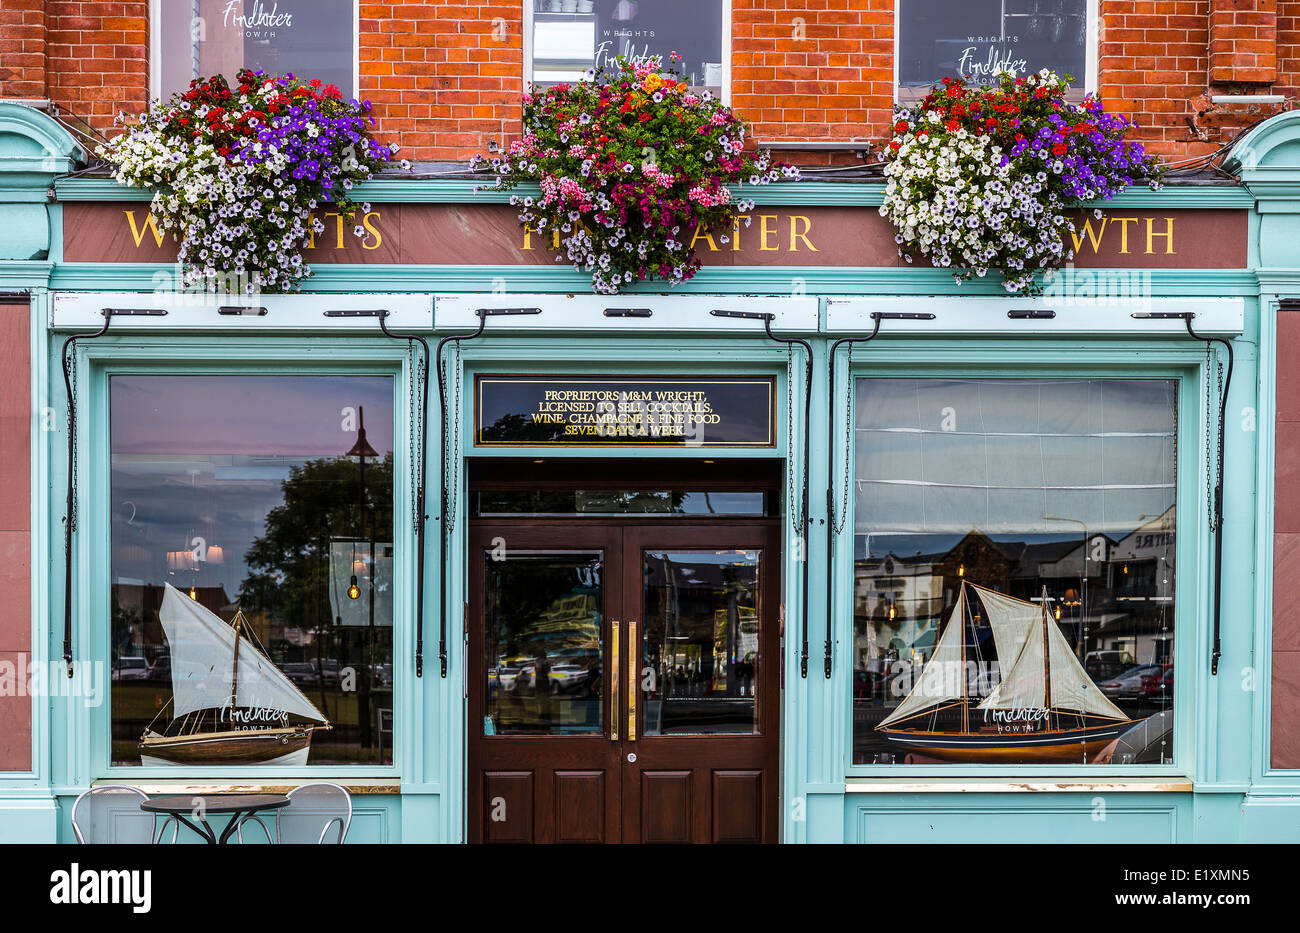 Ireland, Dublin county, the shops of the Howth harbor - Stock Image